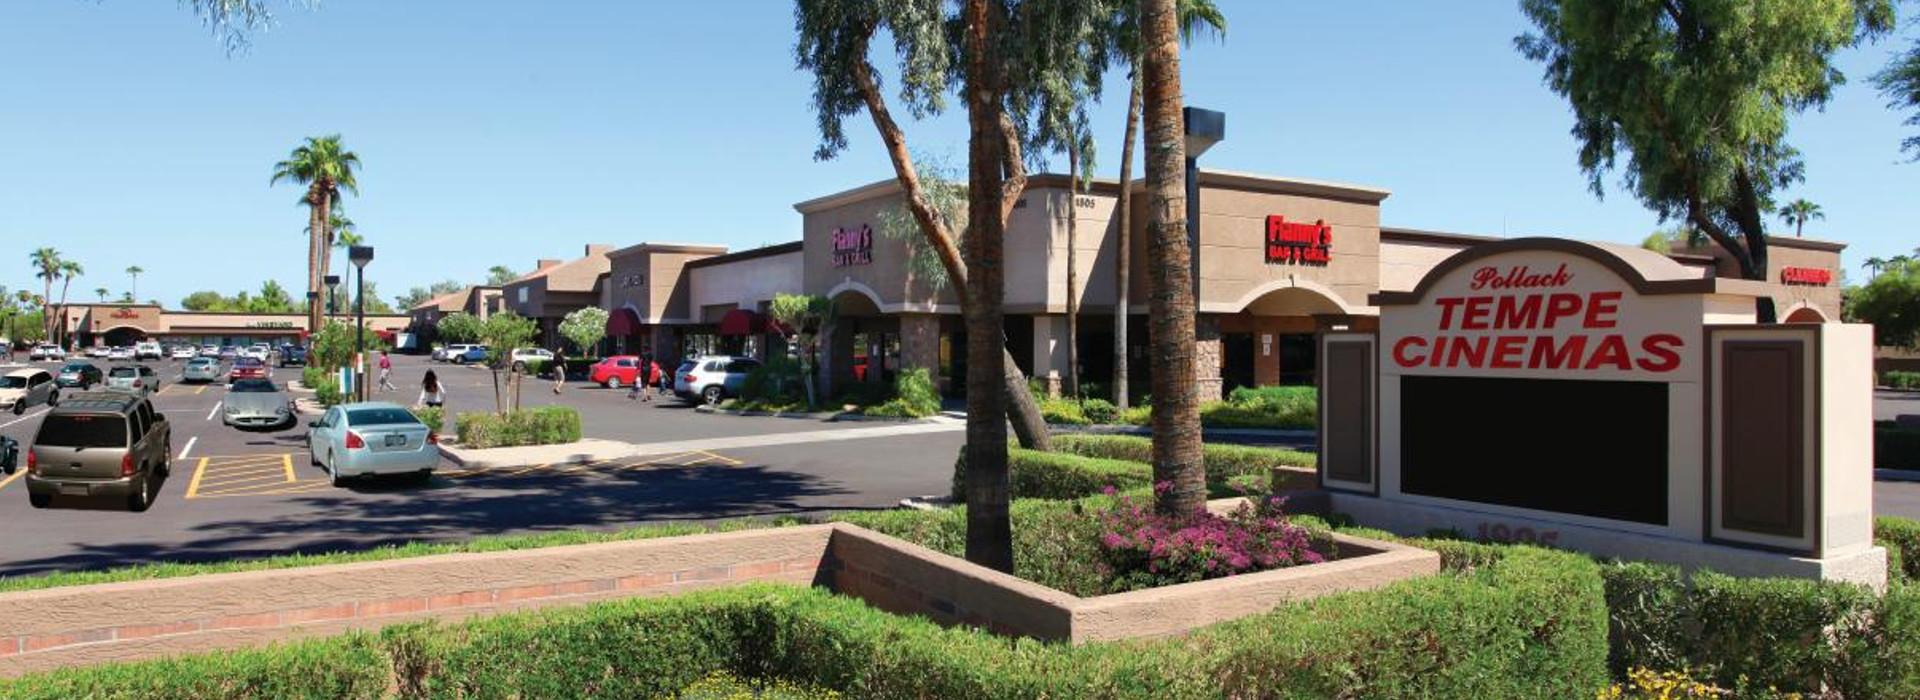 <small>Commercial Real Estate</small>Tempe, Arizona